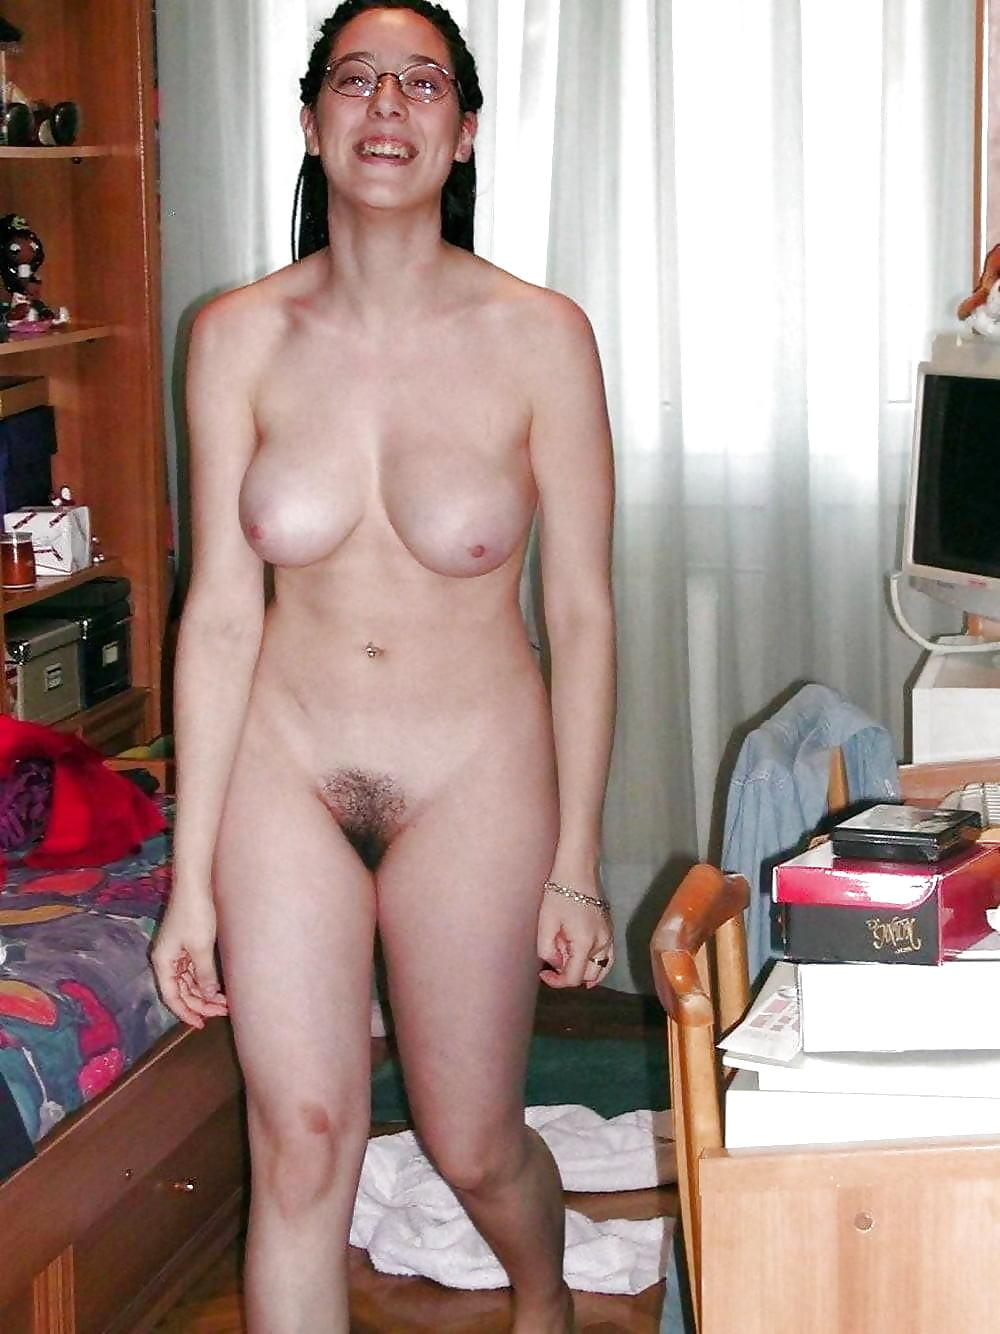 wife-professional-nude-photo-martina-hingis-naked-sex